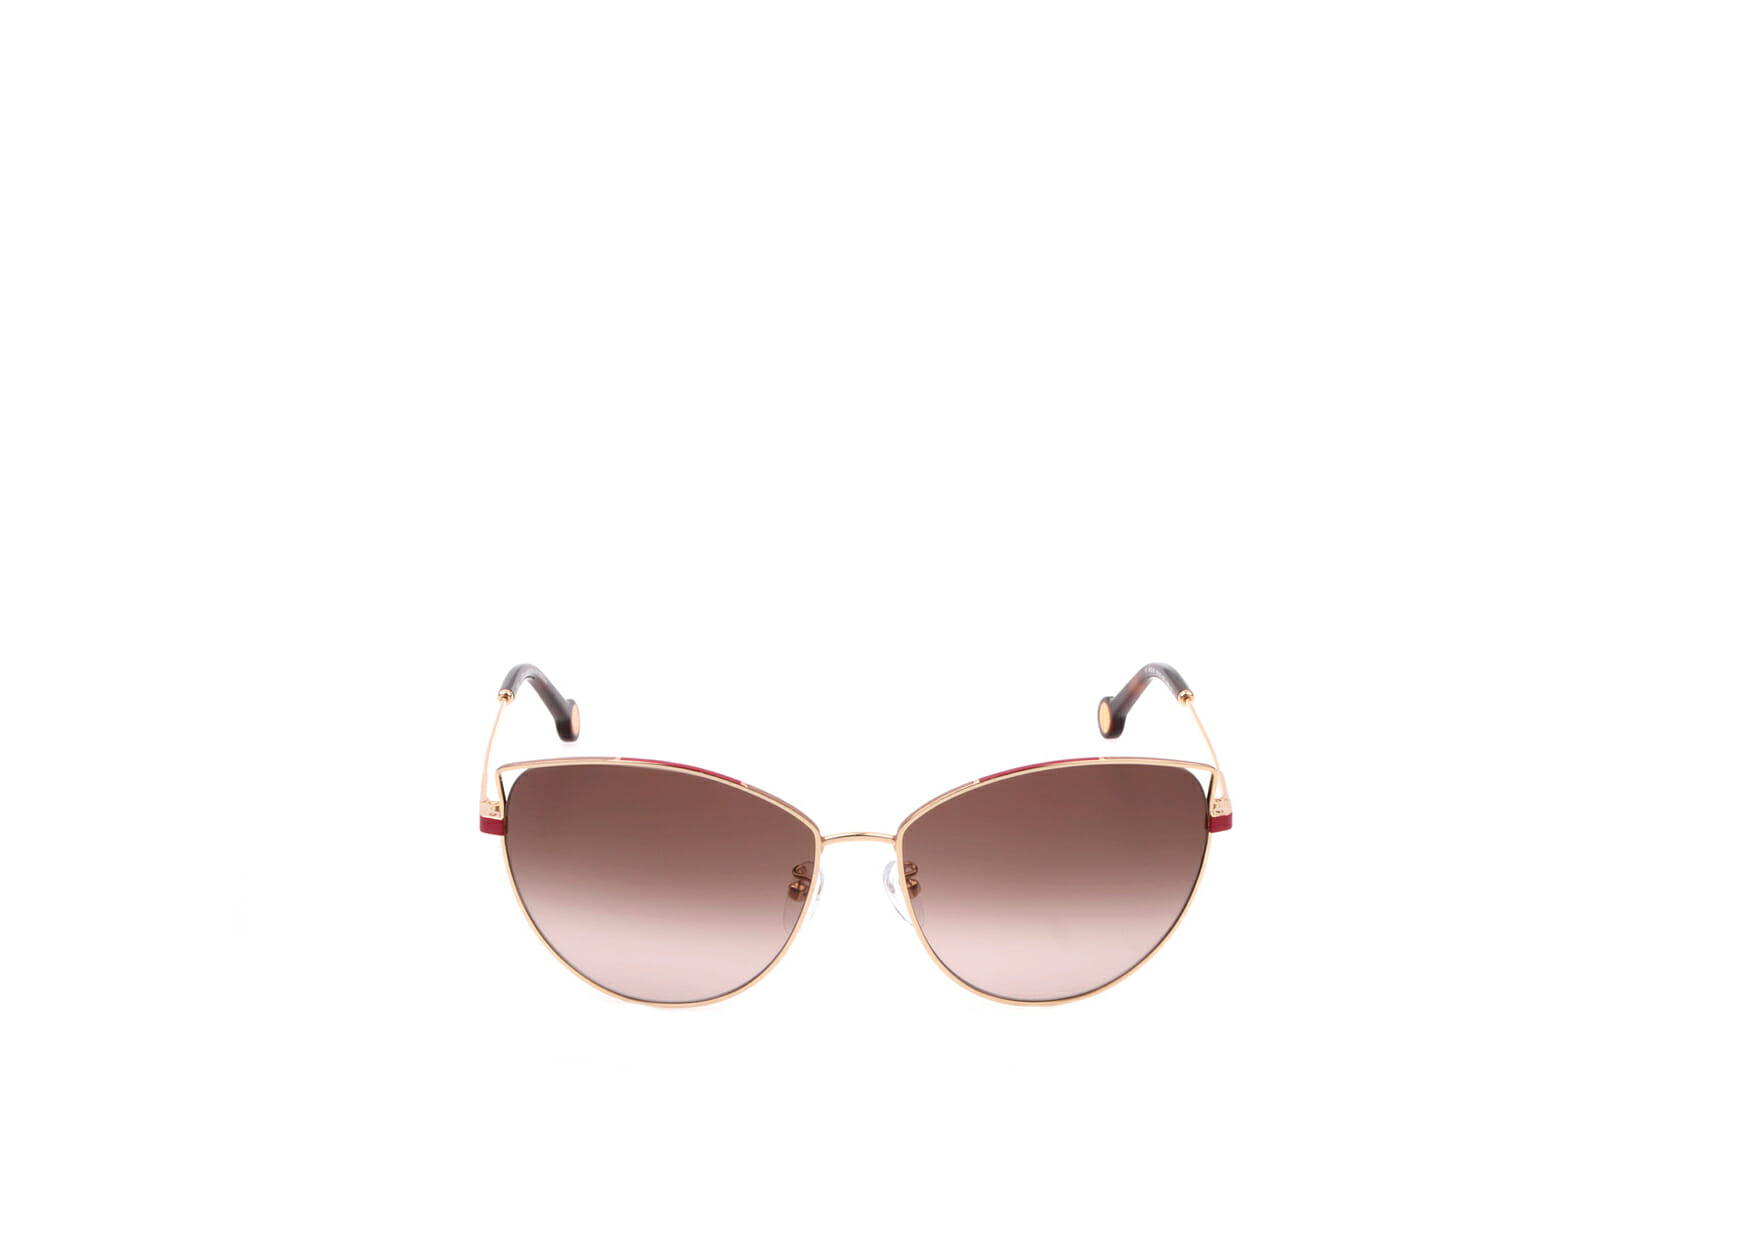 ch carolina herrera eyewear women front